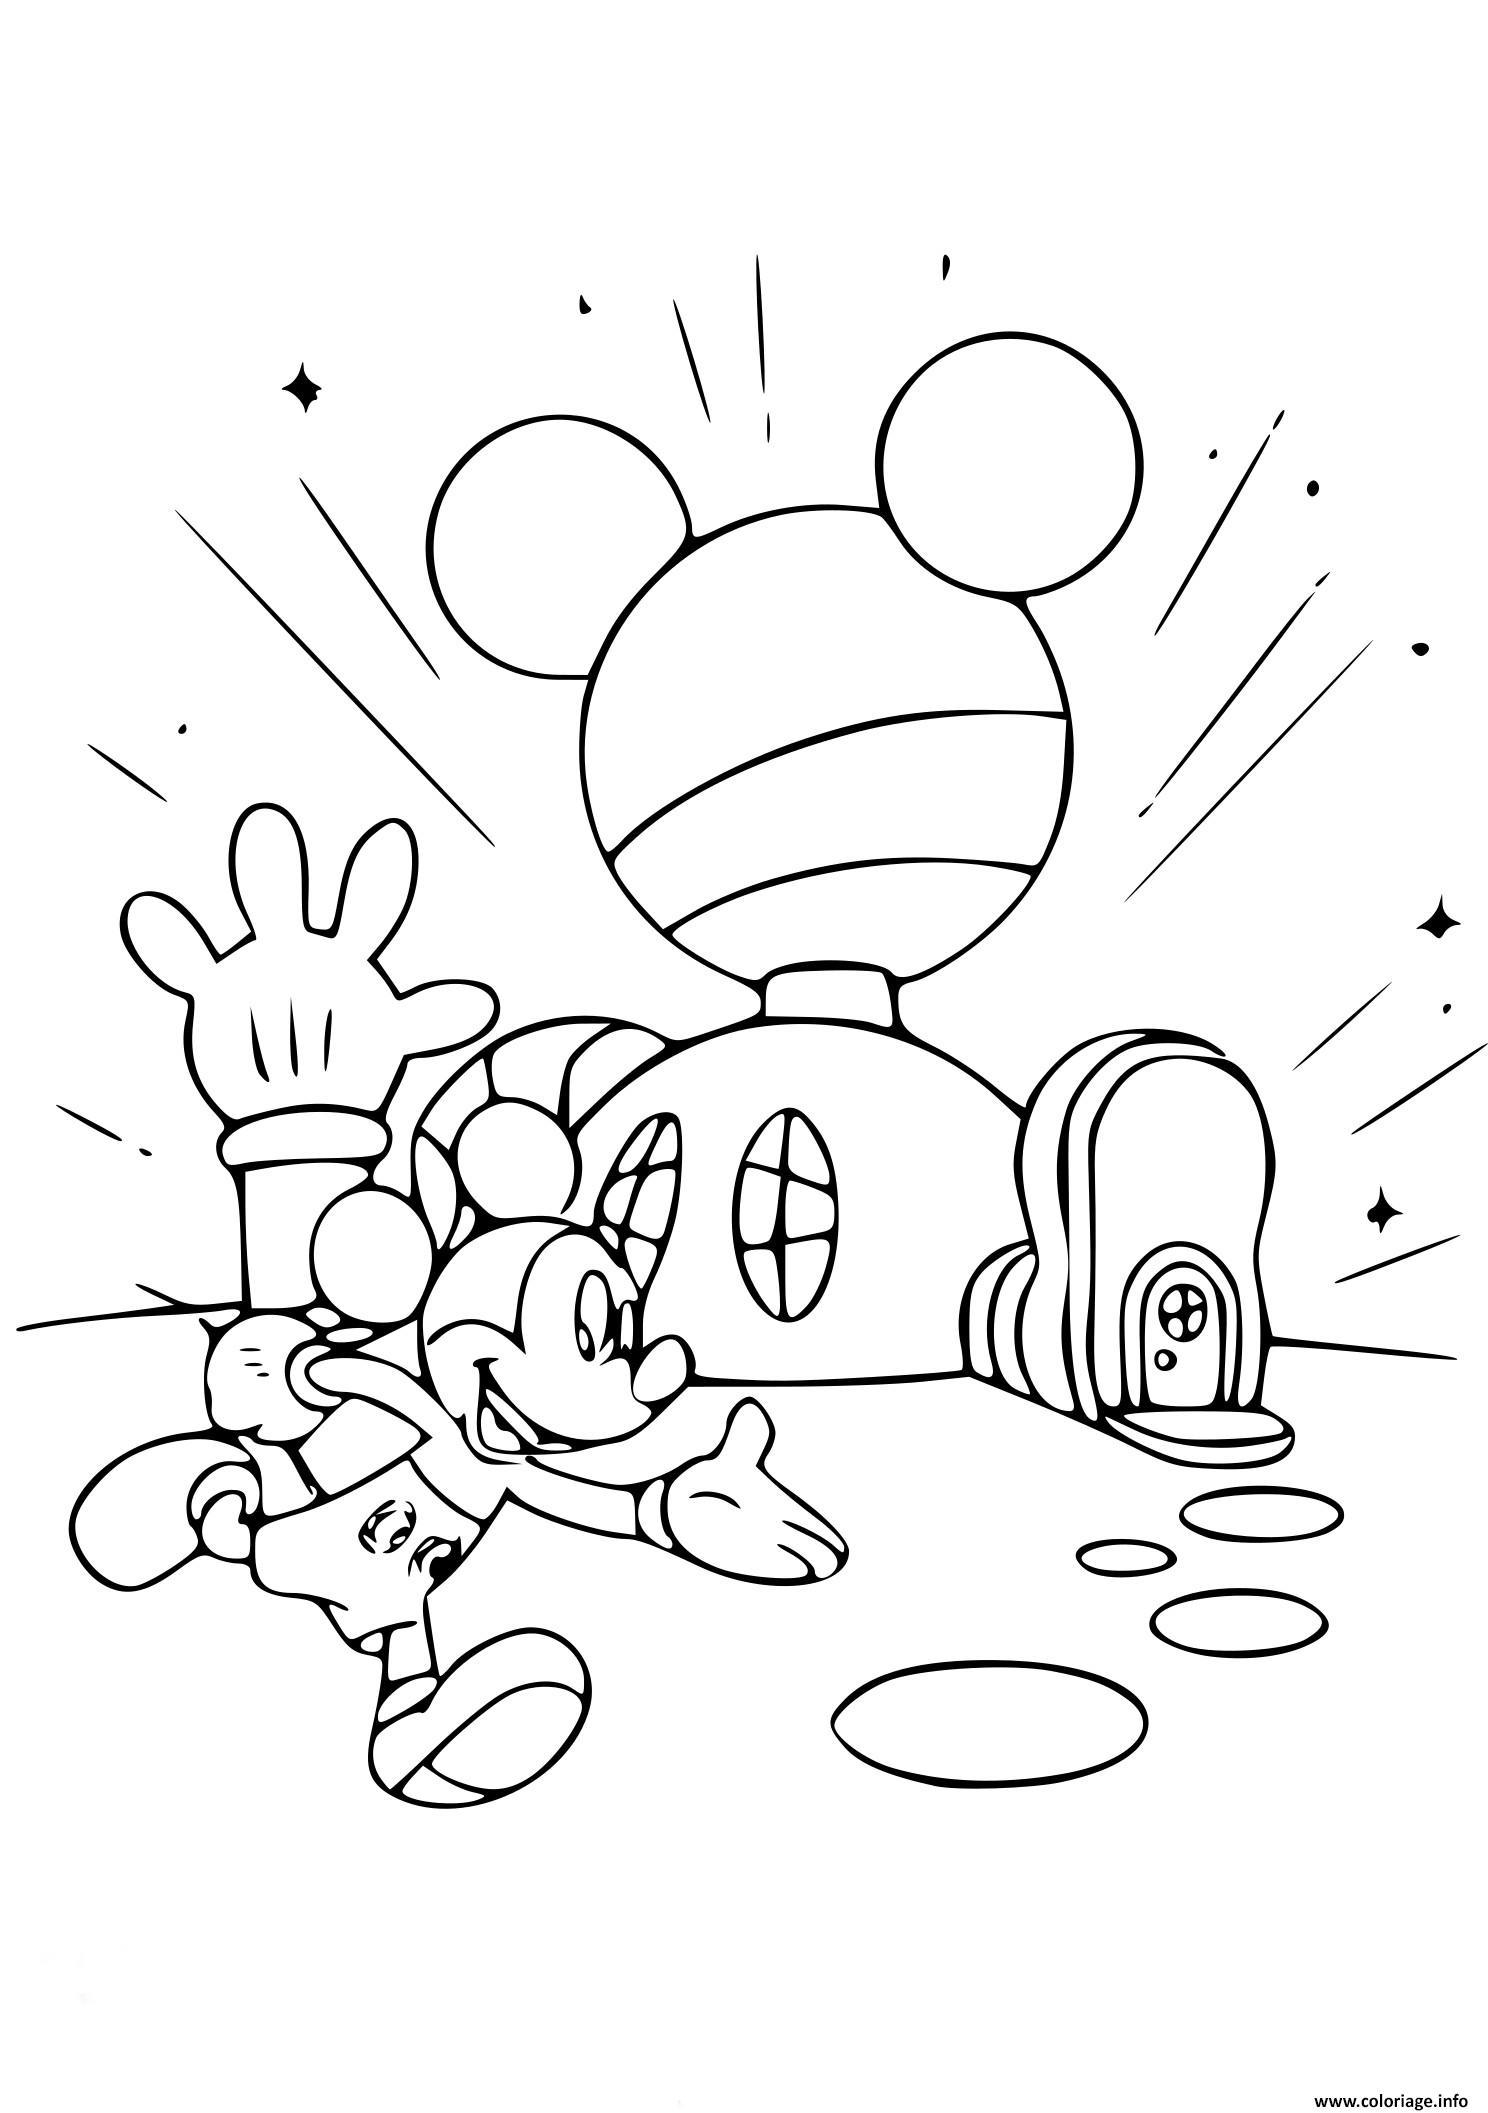 Coloriage Maison De Mickey Dessin